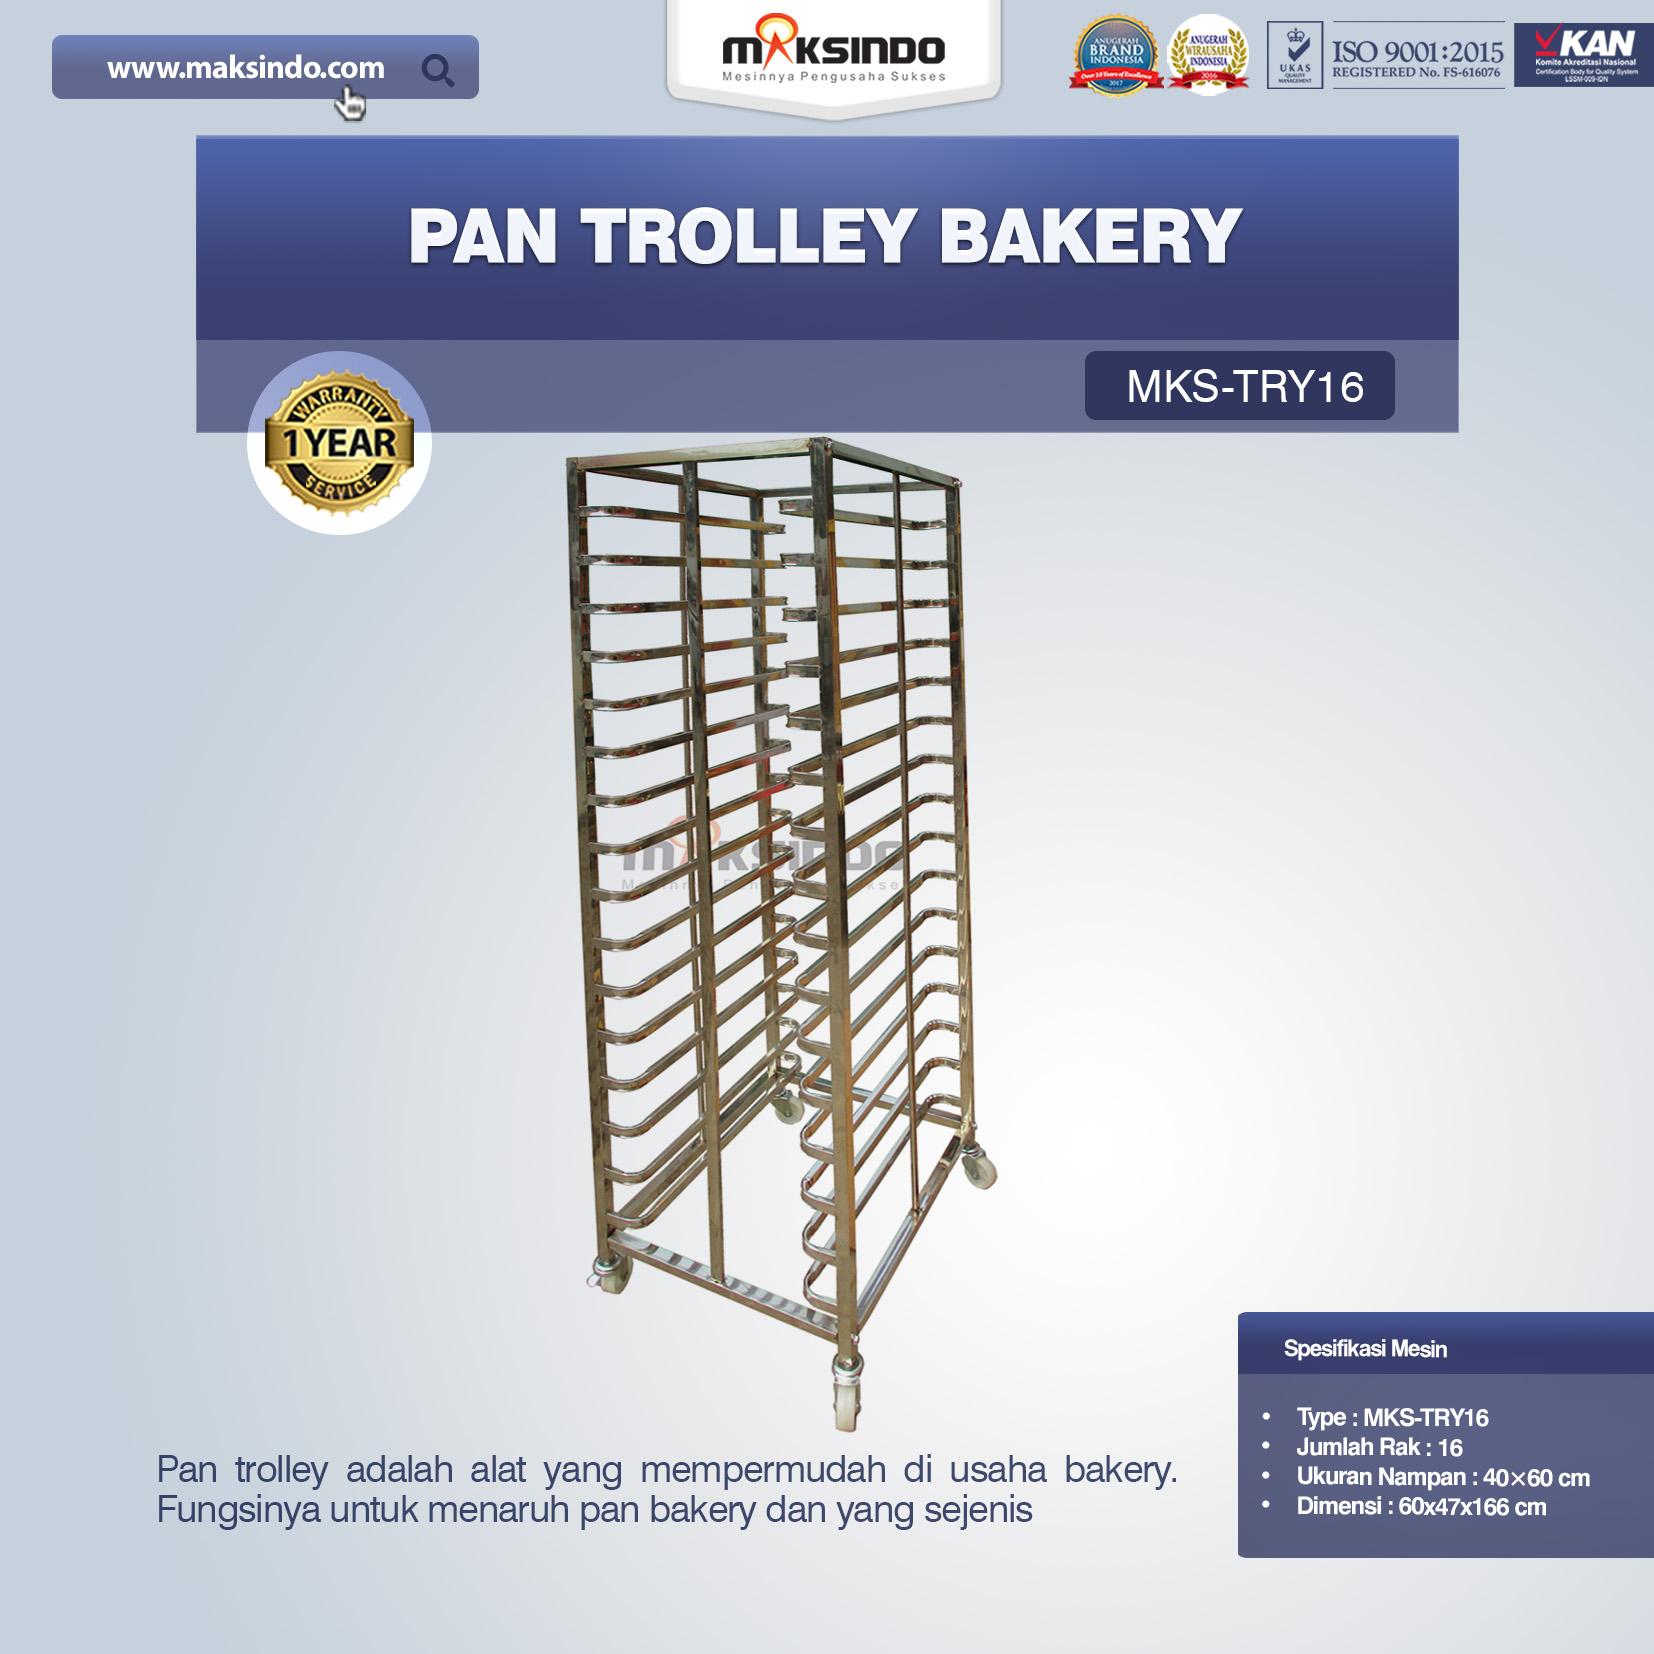 Jual Pan Trolley Bakery (MKS-TRY16) di Semarang